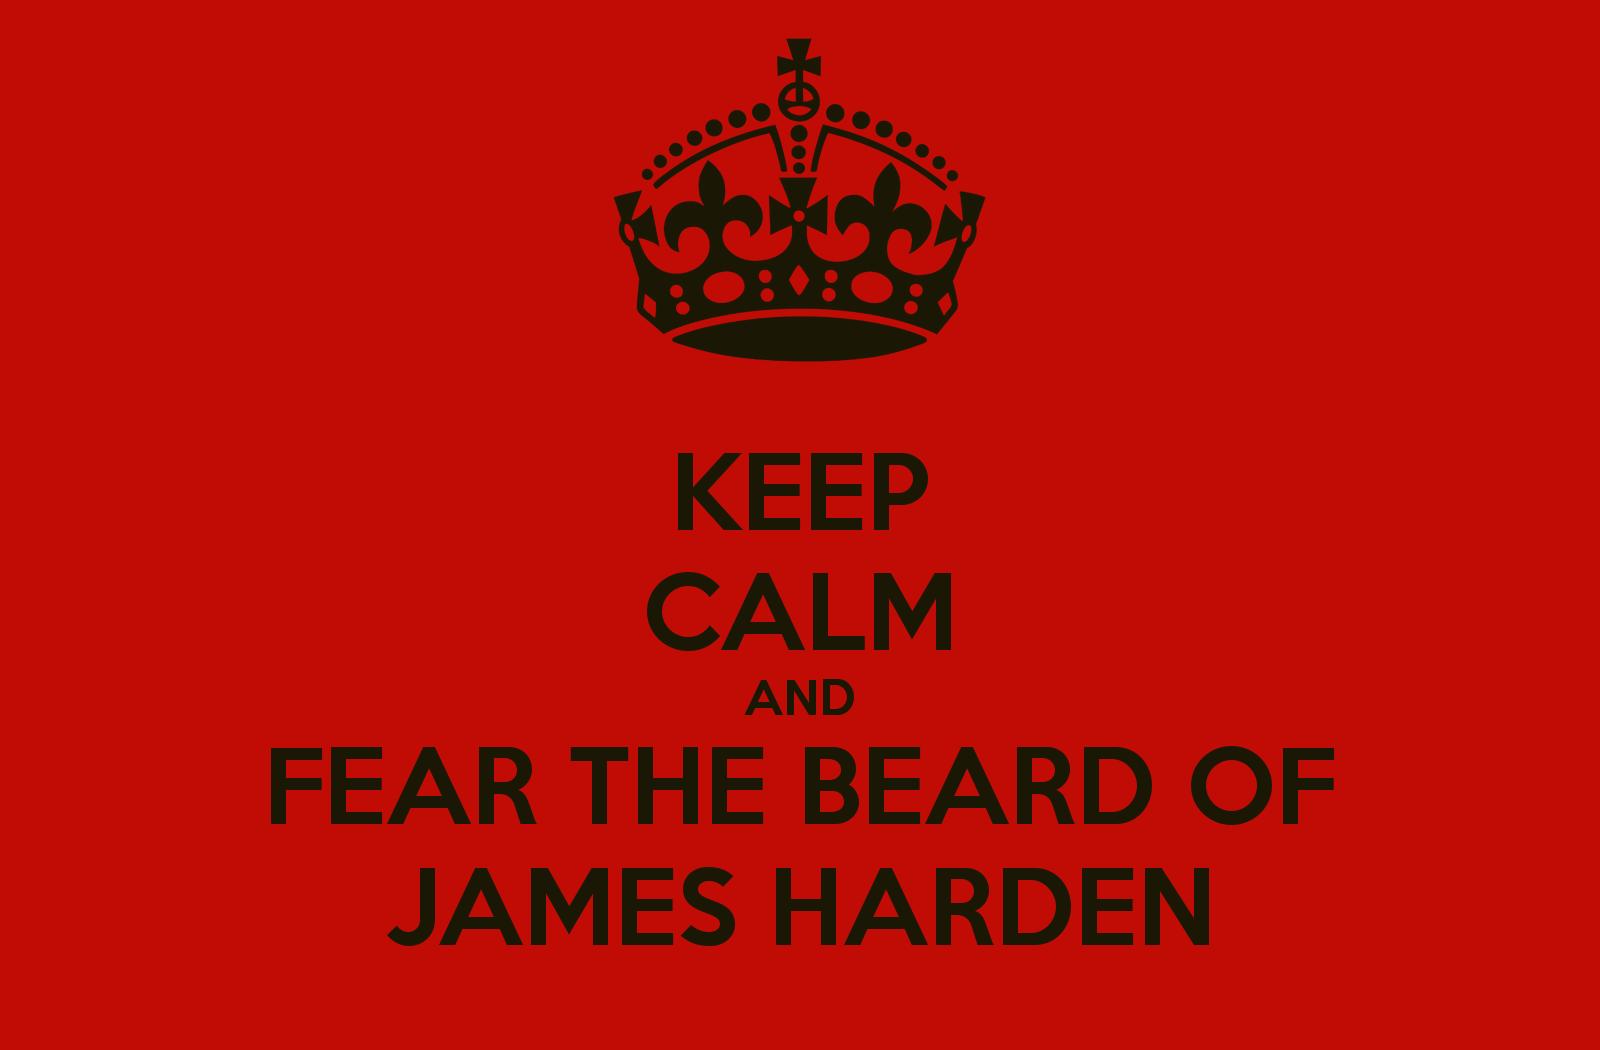 KEEP CALM AND FEAR THE BEARD OF JAMES HARDEN   KEEP CALM AND CARRY ON 1600x1050